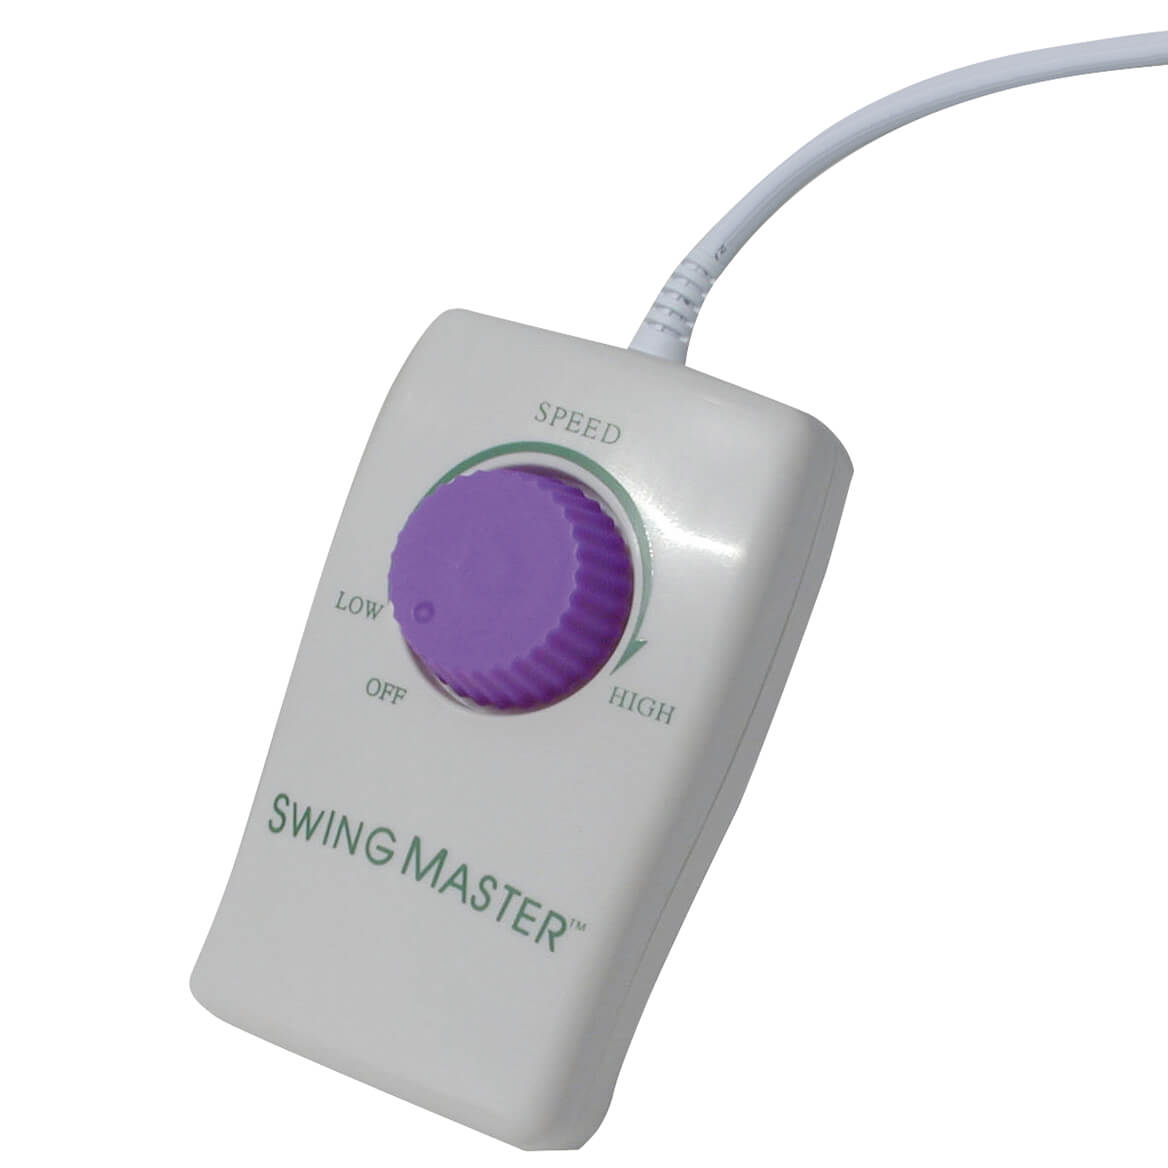 Swing Master™-369682